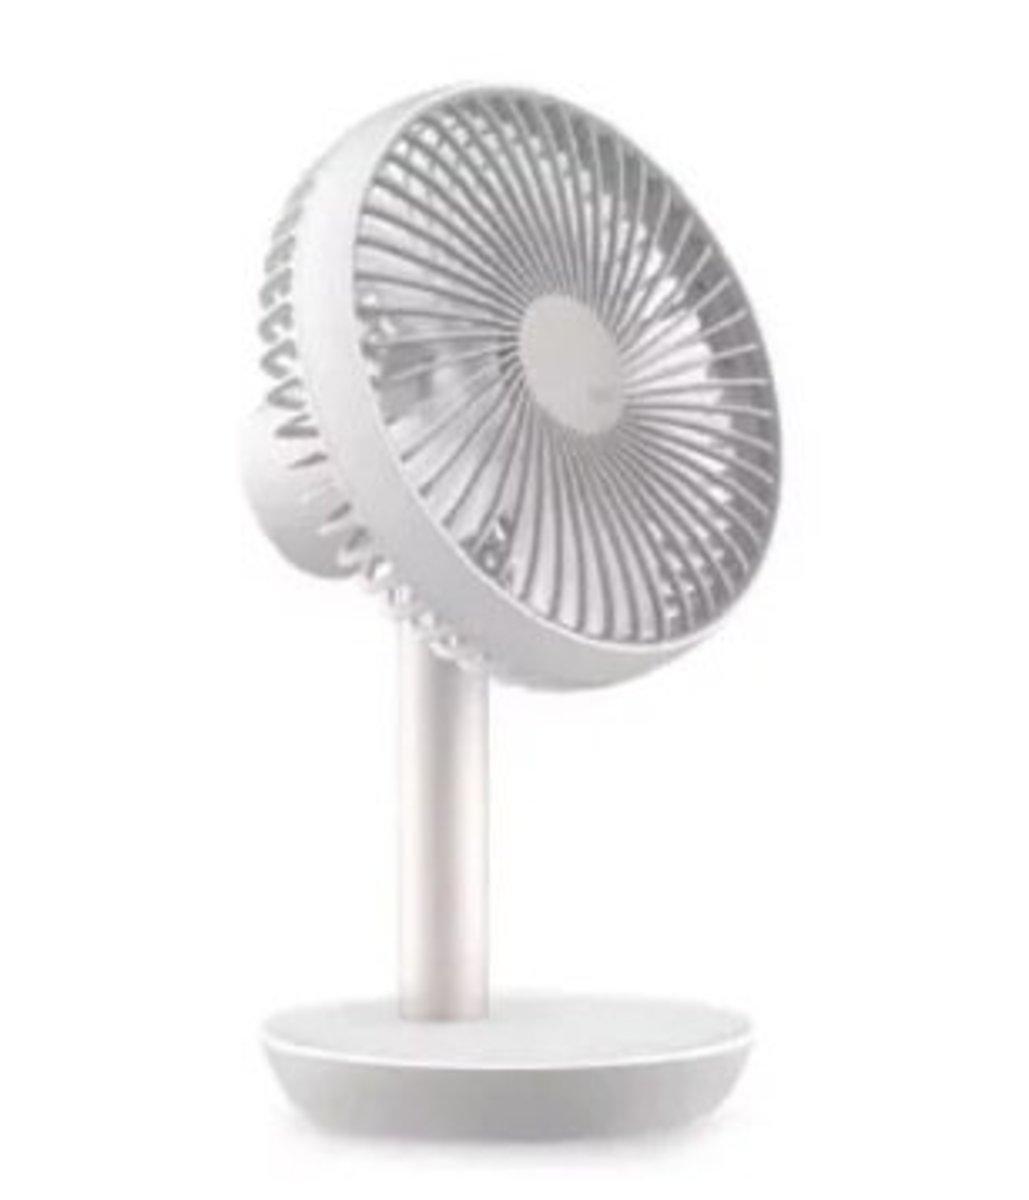 N9 Stand 2 Portable Fan[White]